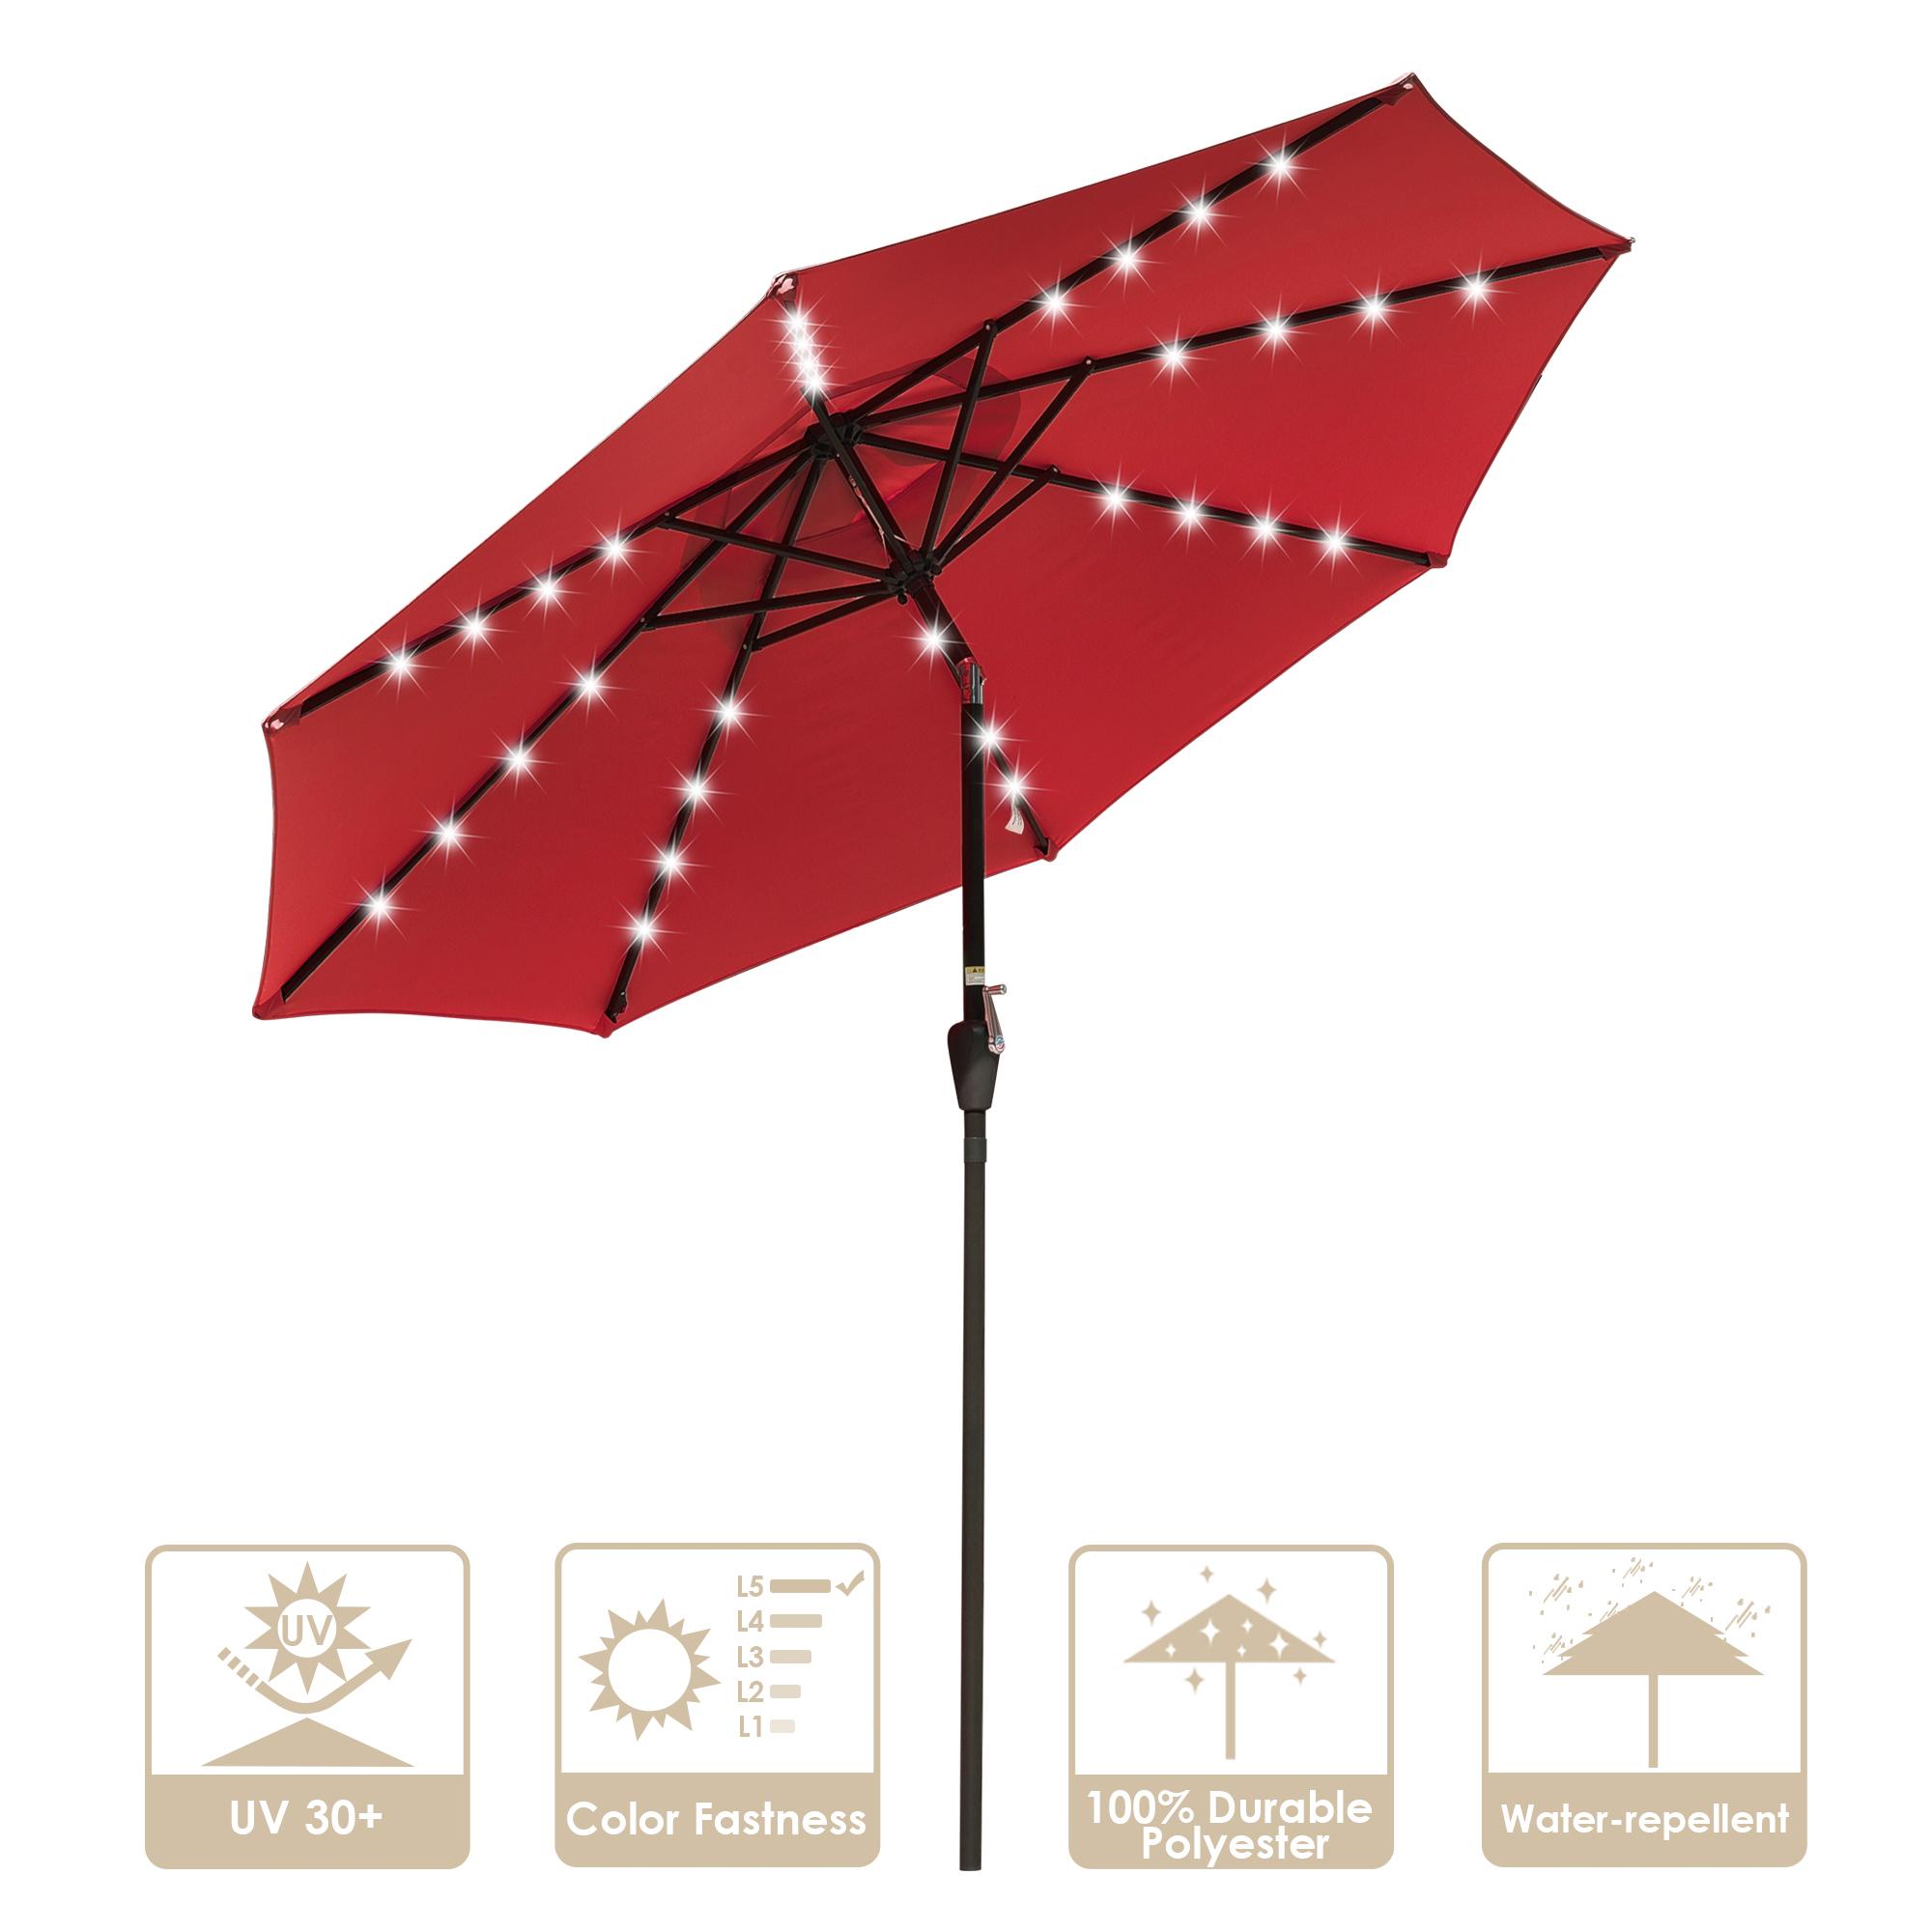 thumbnail 55 - 9' Patio Outdoor Umbrella Solar LED 8 Rib Garden Parasol Yard Deck Table Shade